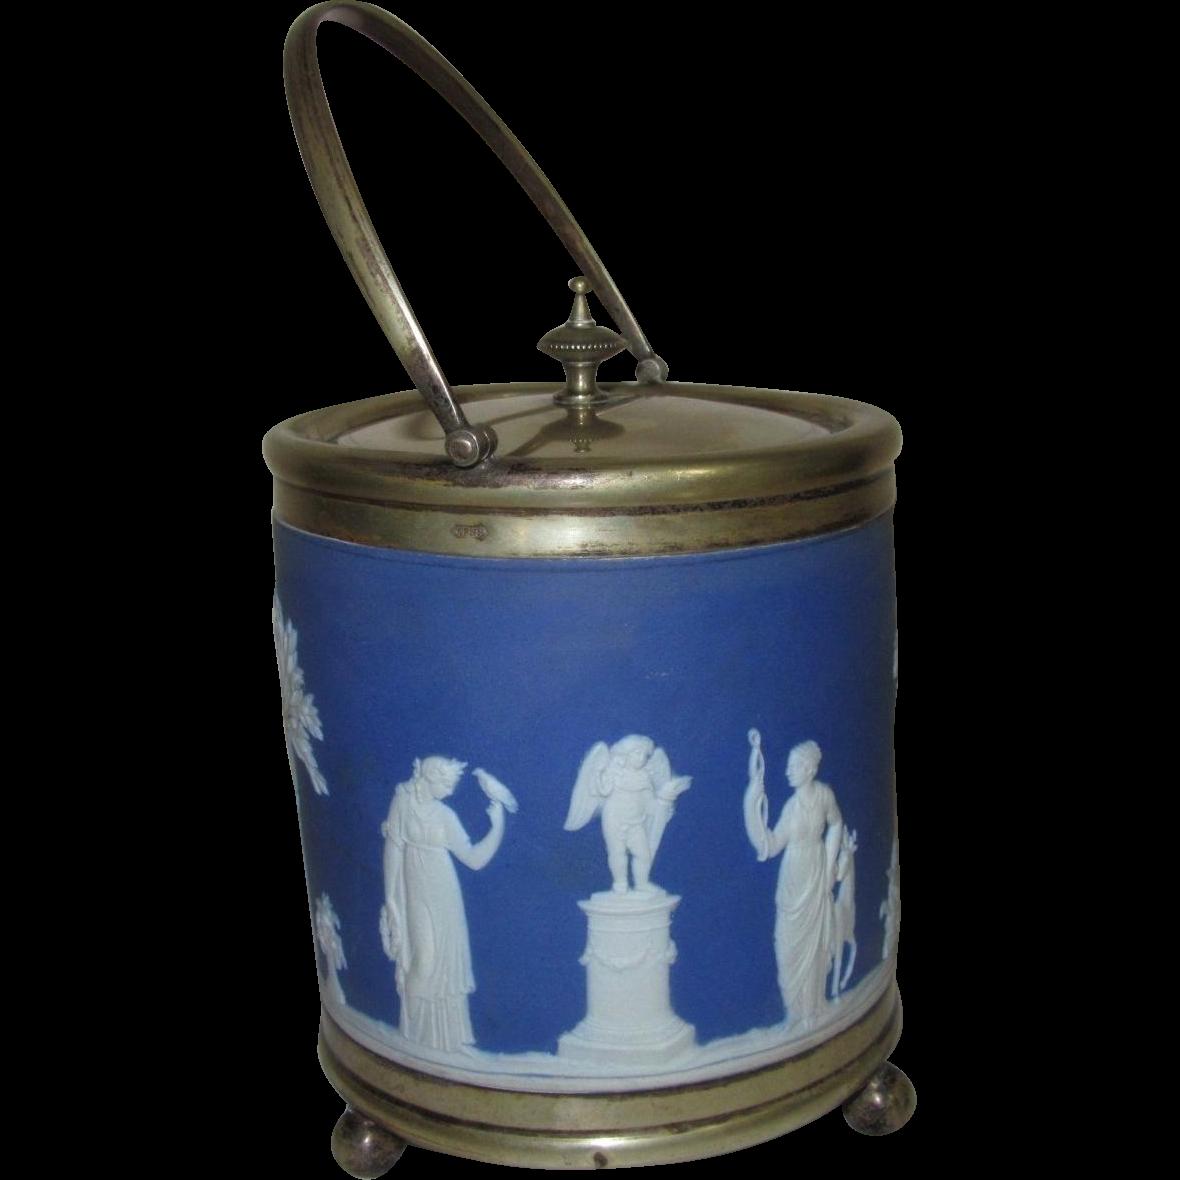 Wedgwood Biscuit Barrel, Indigo Blue Jasperware, Greek Gods & Goddesses